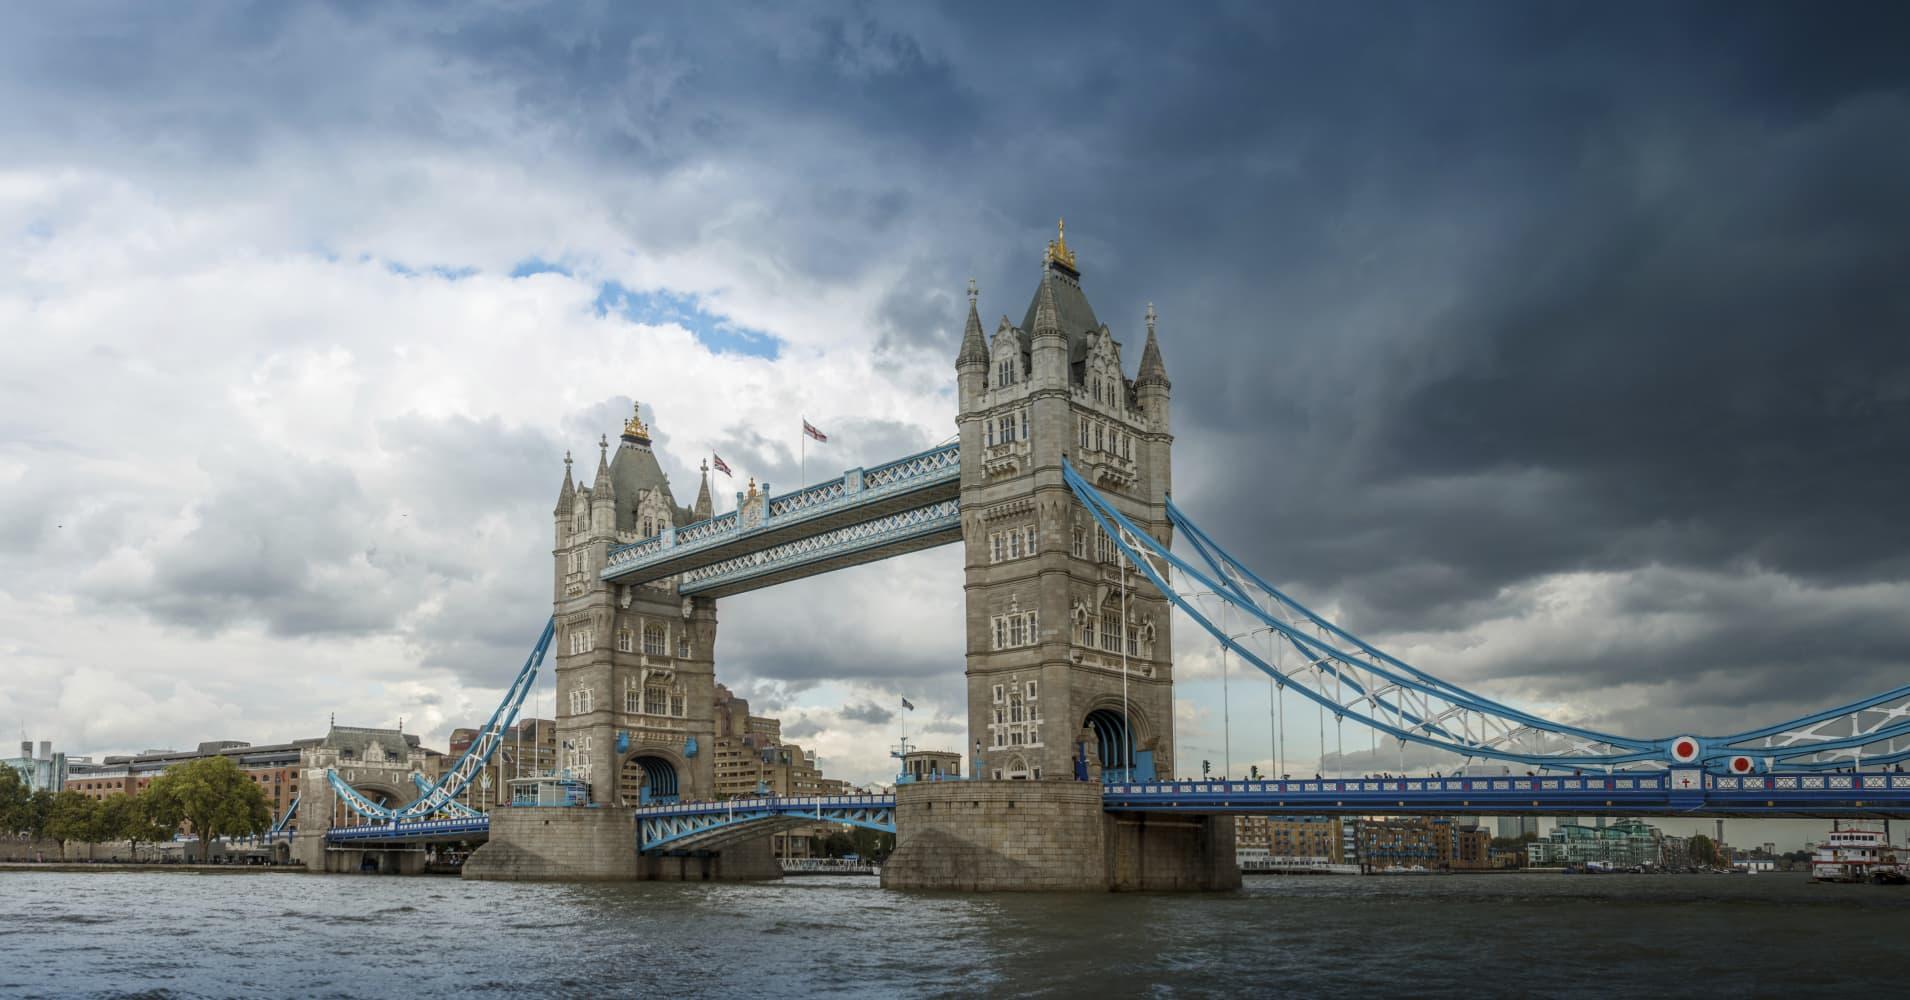 The UK's future economic storm just got worse